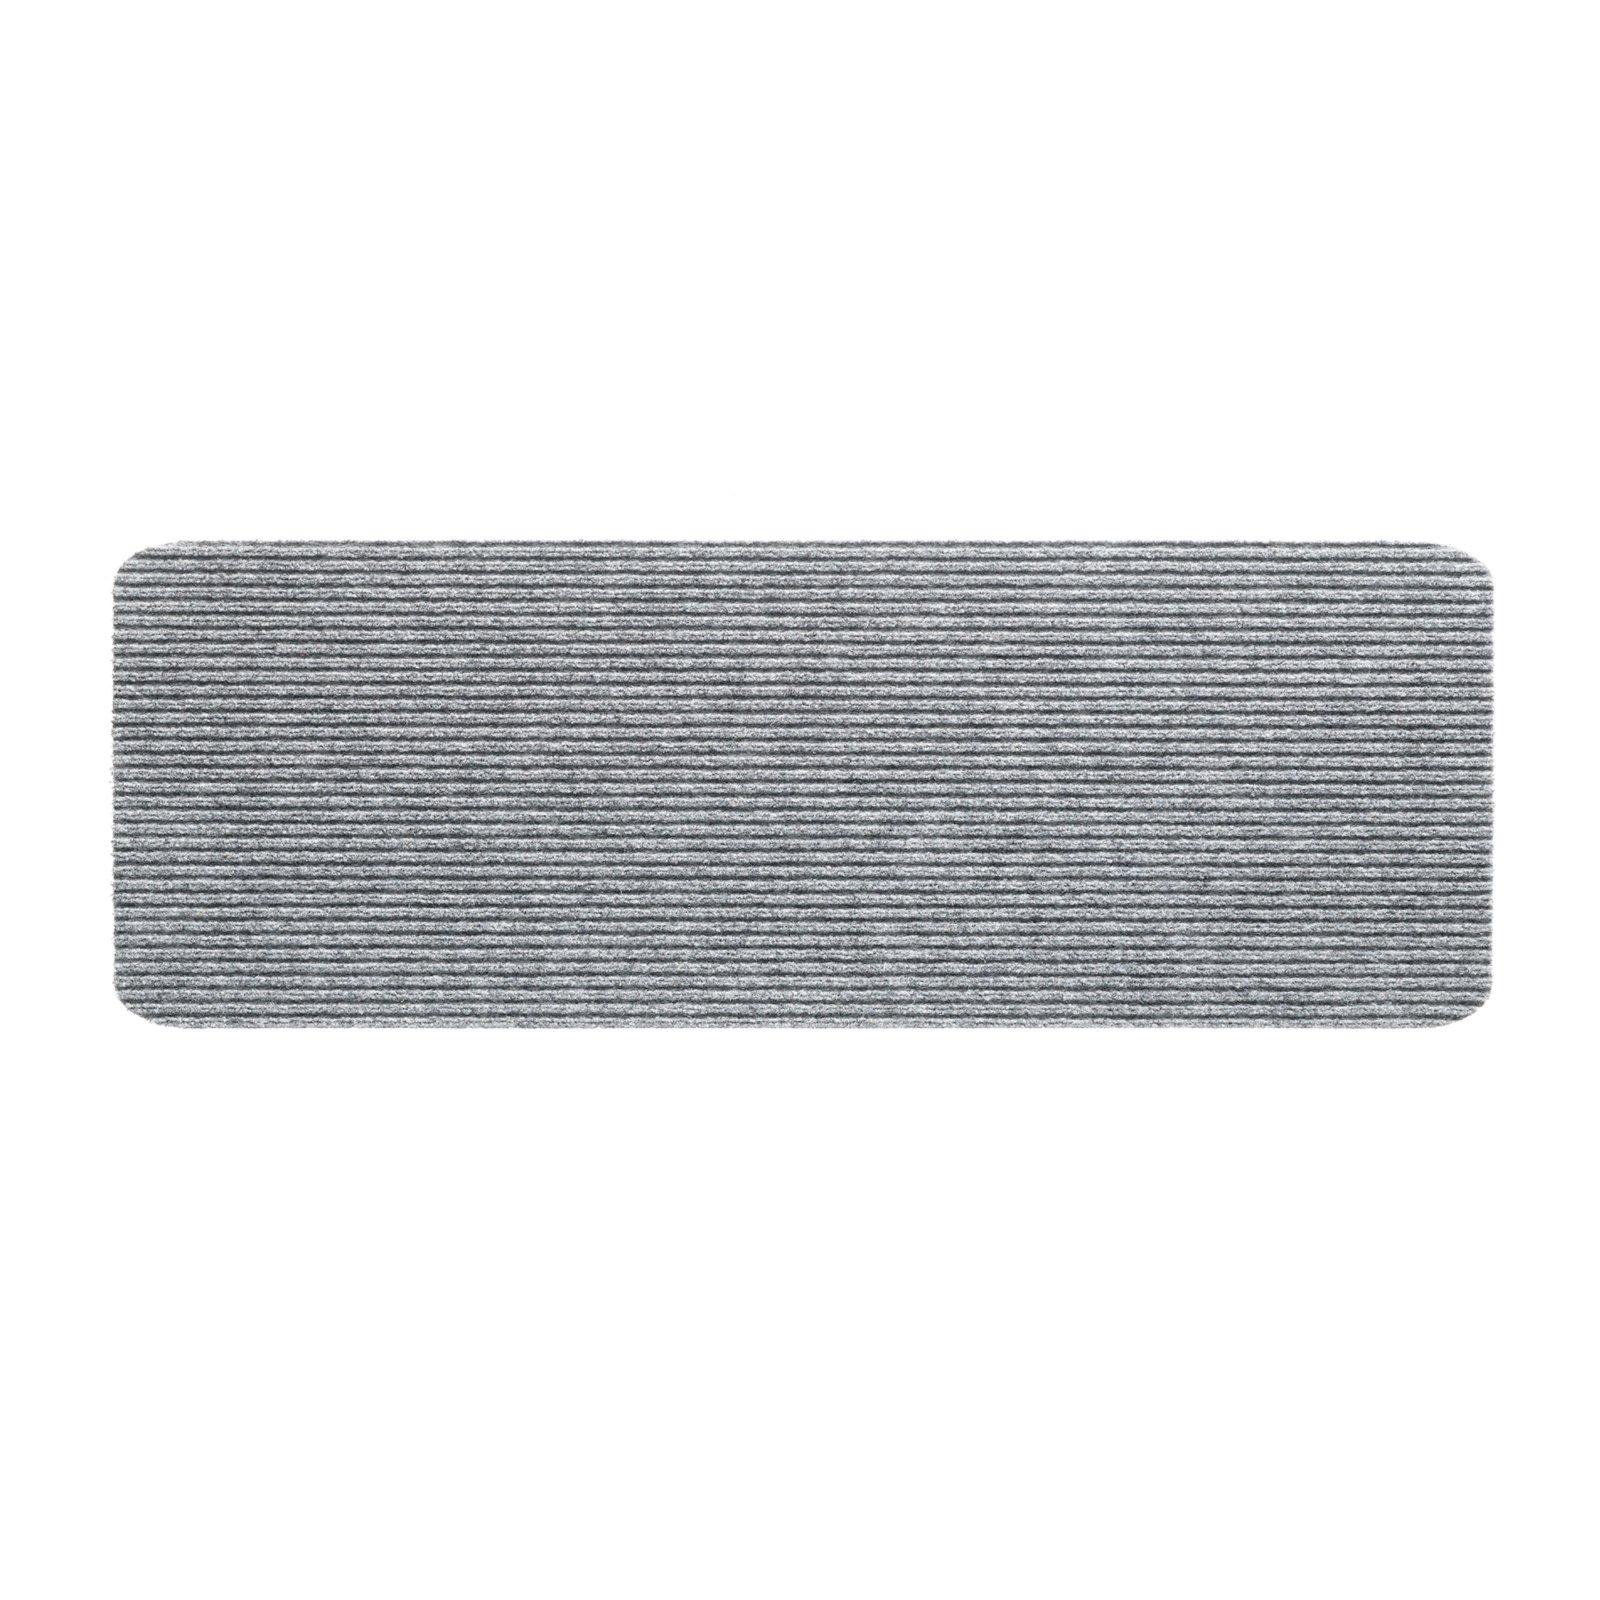 Fußmatte RENOX - hellgrau - 60x25 cm